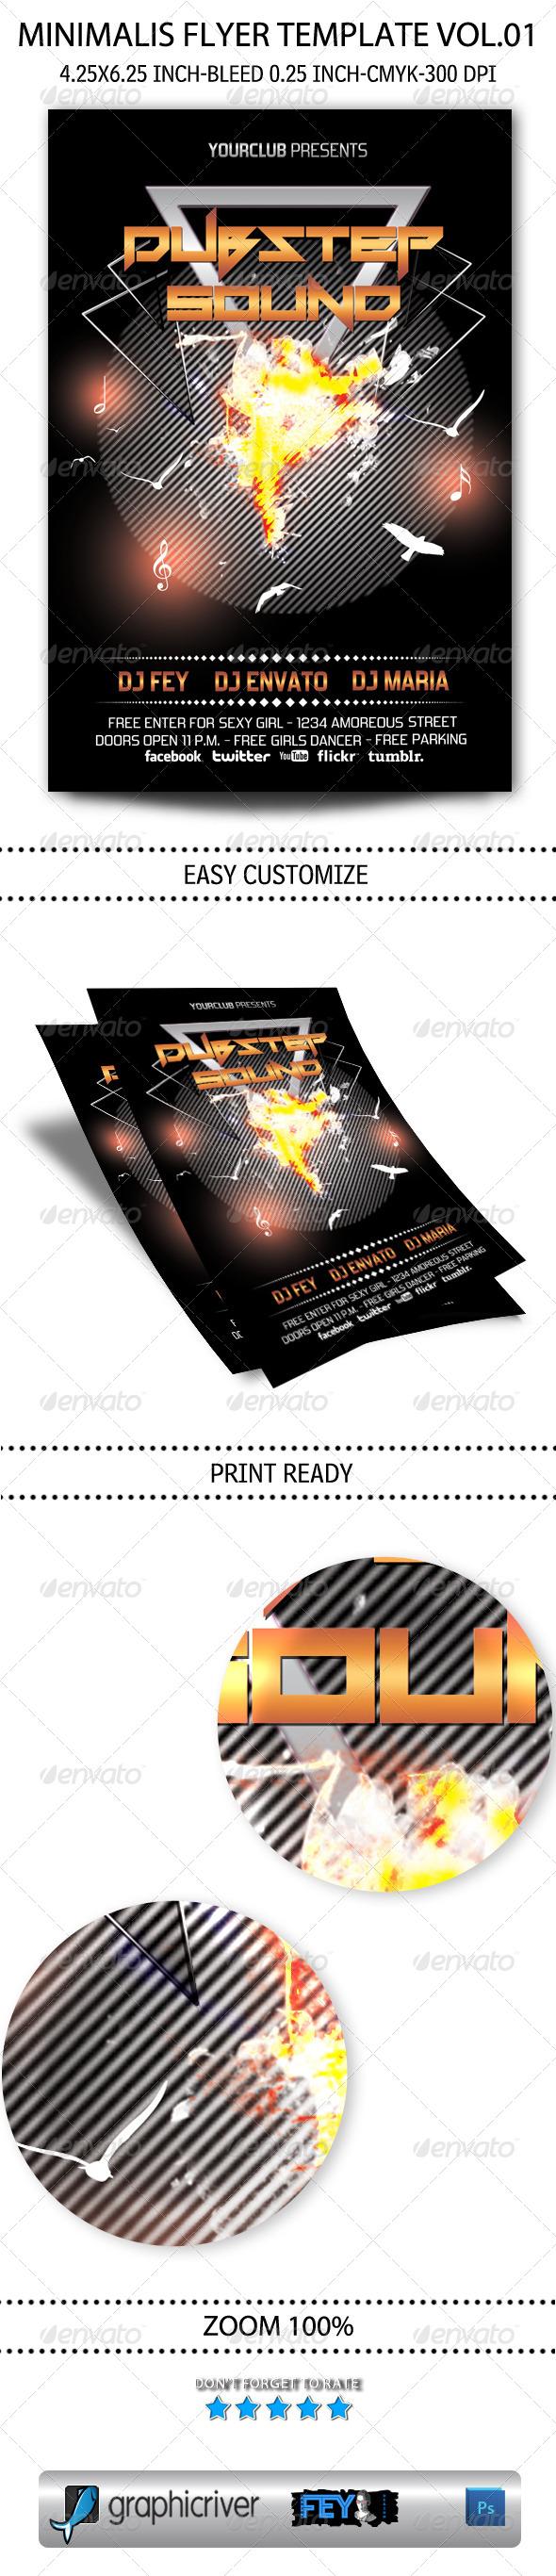 GraphicRiver Minimalist Flyer Template Vol.01 5789086